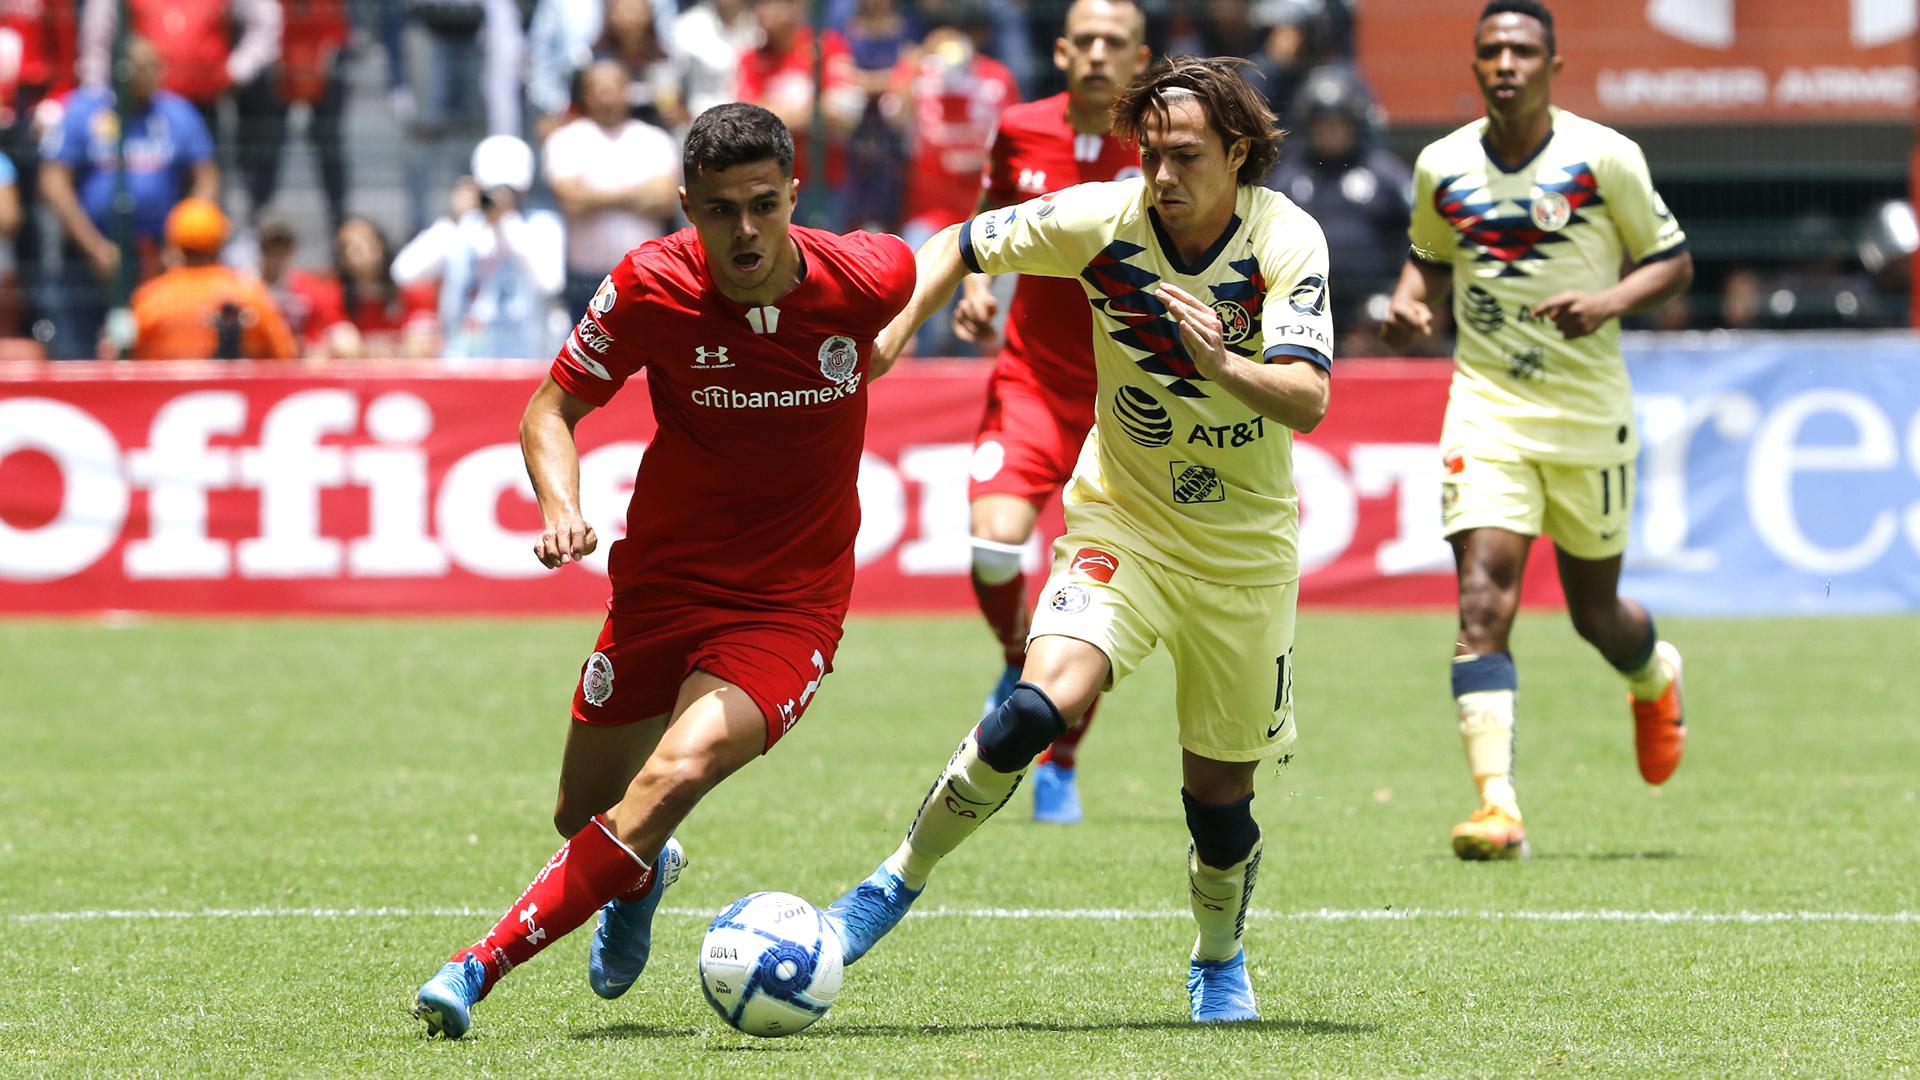 Triunfo necesario - Deportivo Toluca F.C.